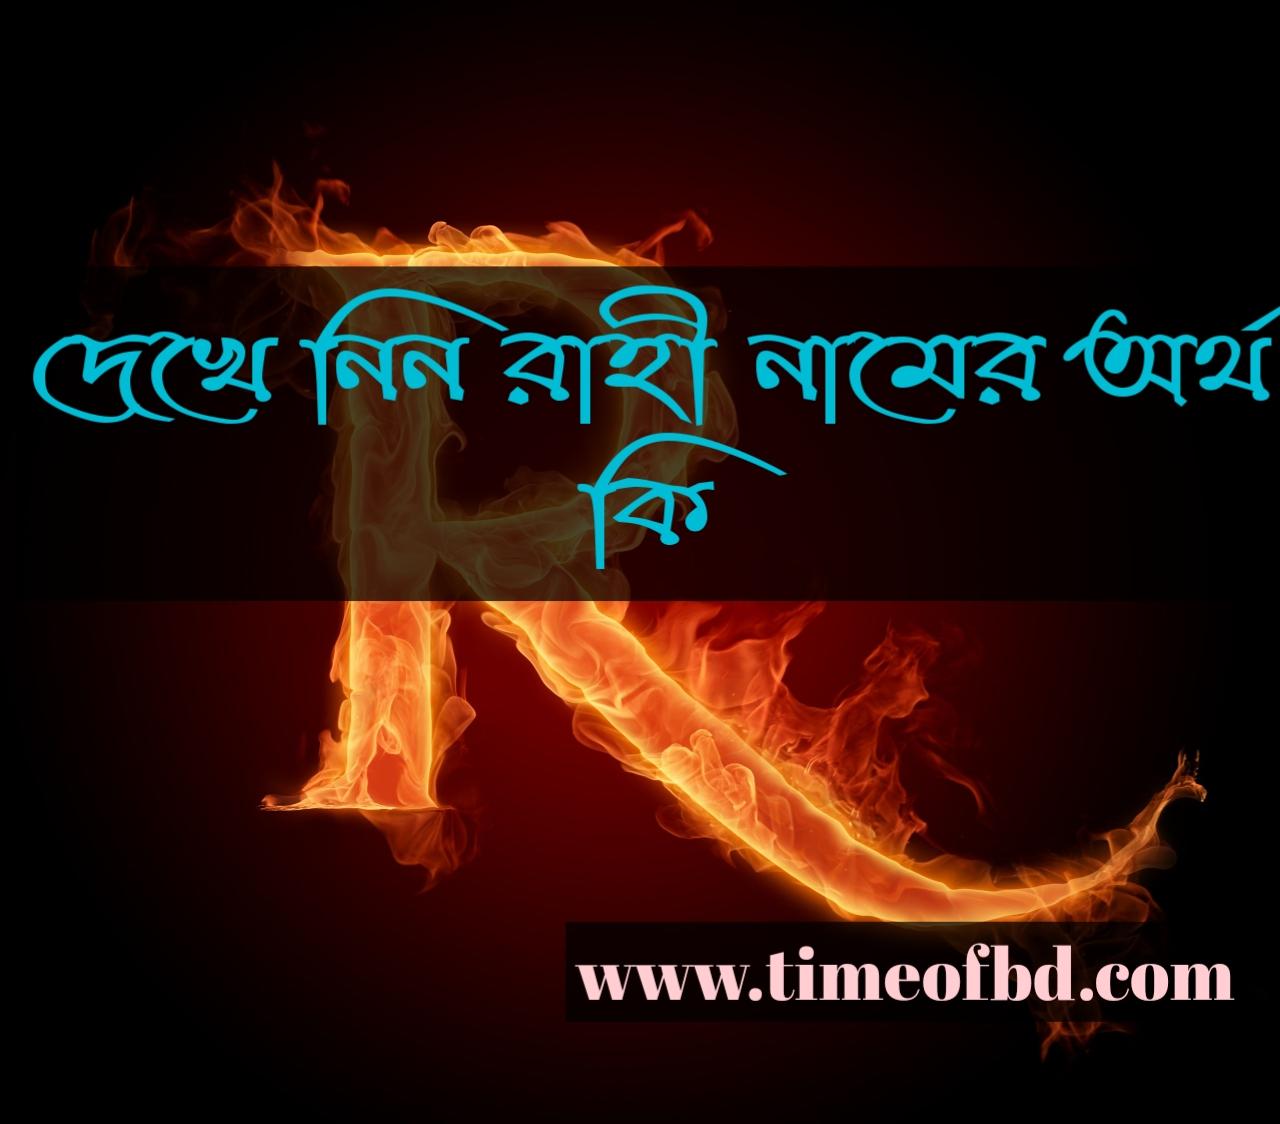 Rahi name meaning in Bengali, রাহী নামের অর্থ কি, রাহী নামের বাংলা অর্থ কি, রাহী নামের ইসলামিক অর্থ কি,